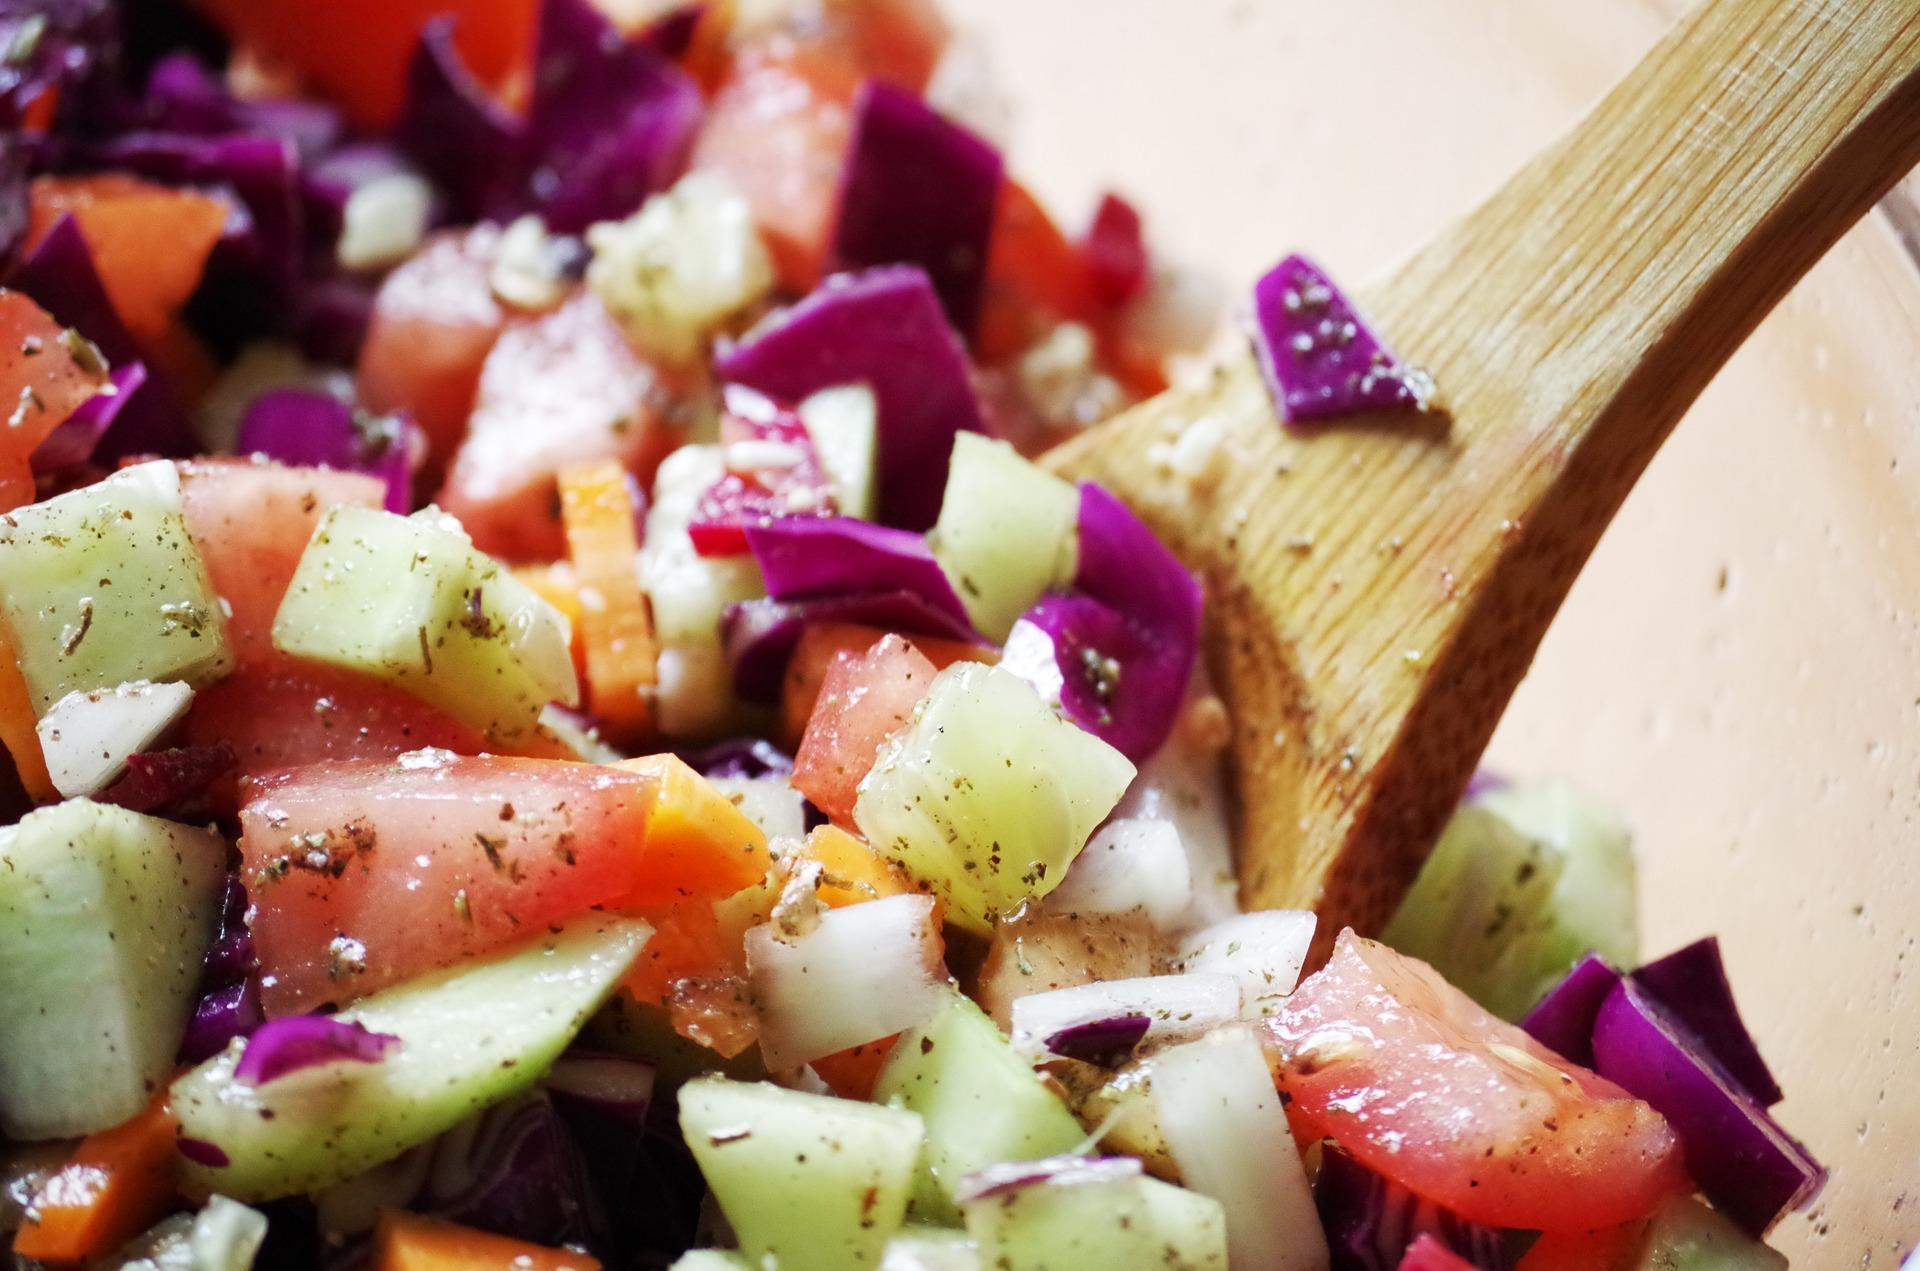 vegetables-1578259_1920.jpg